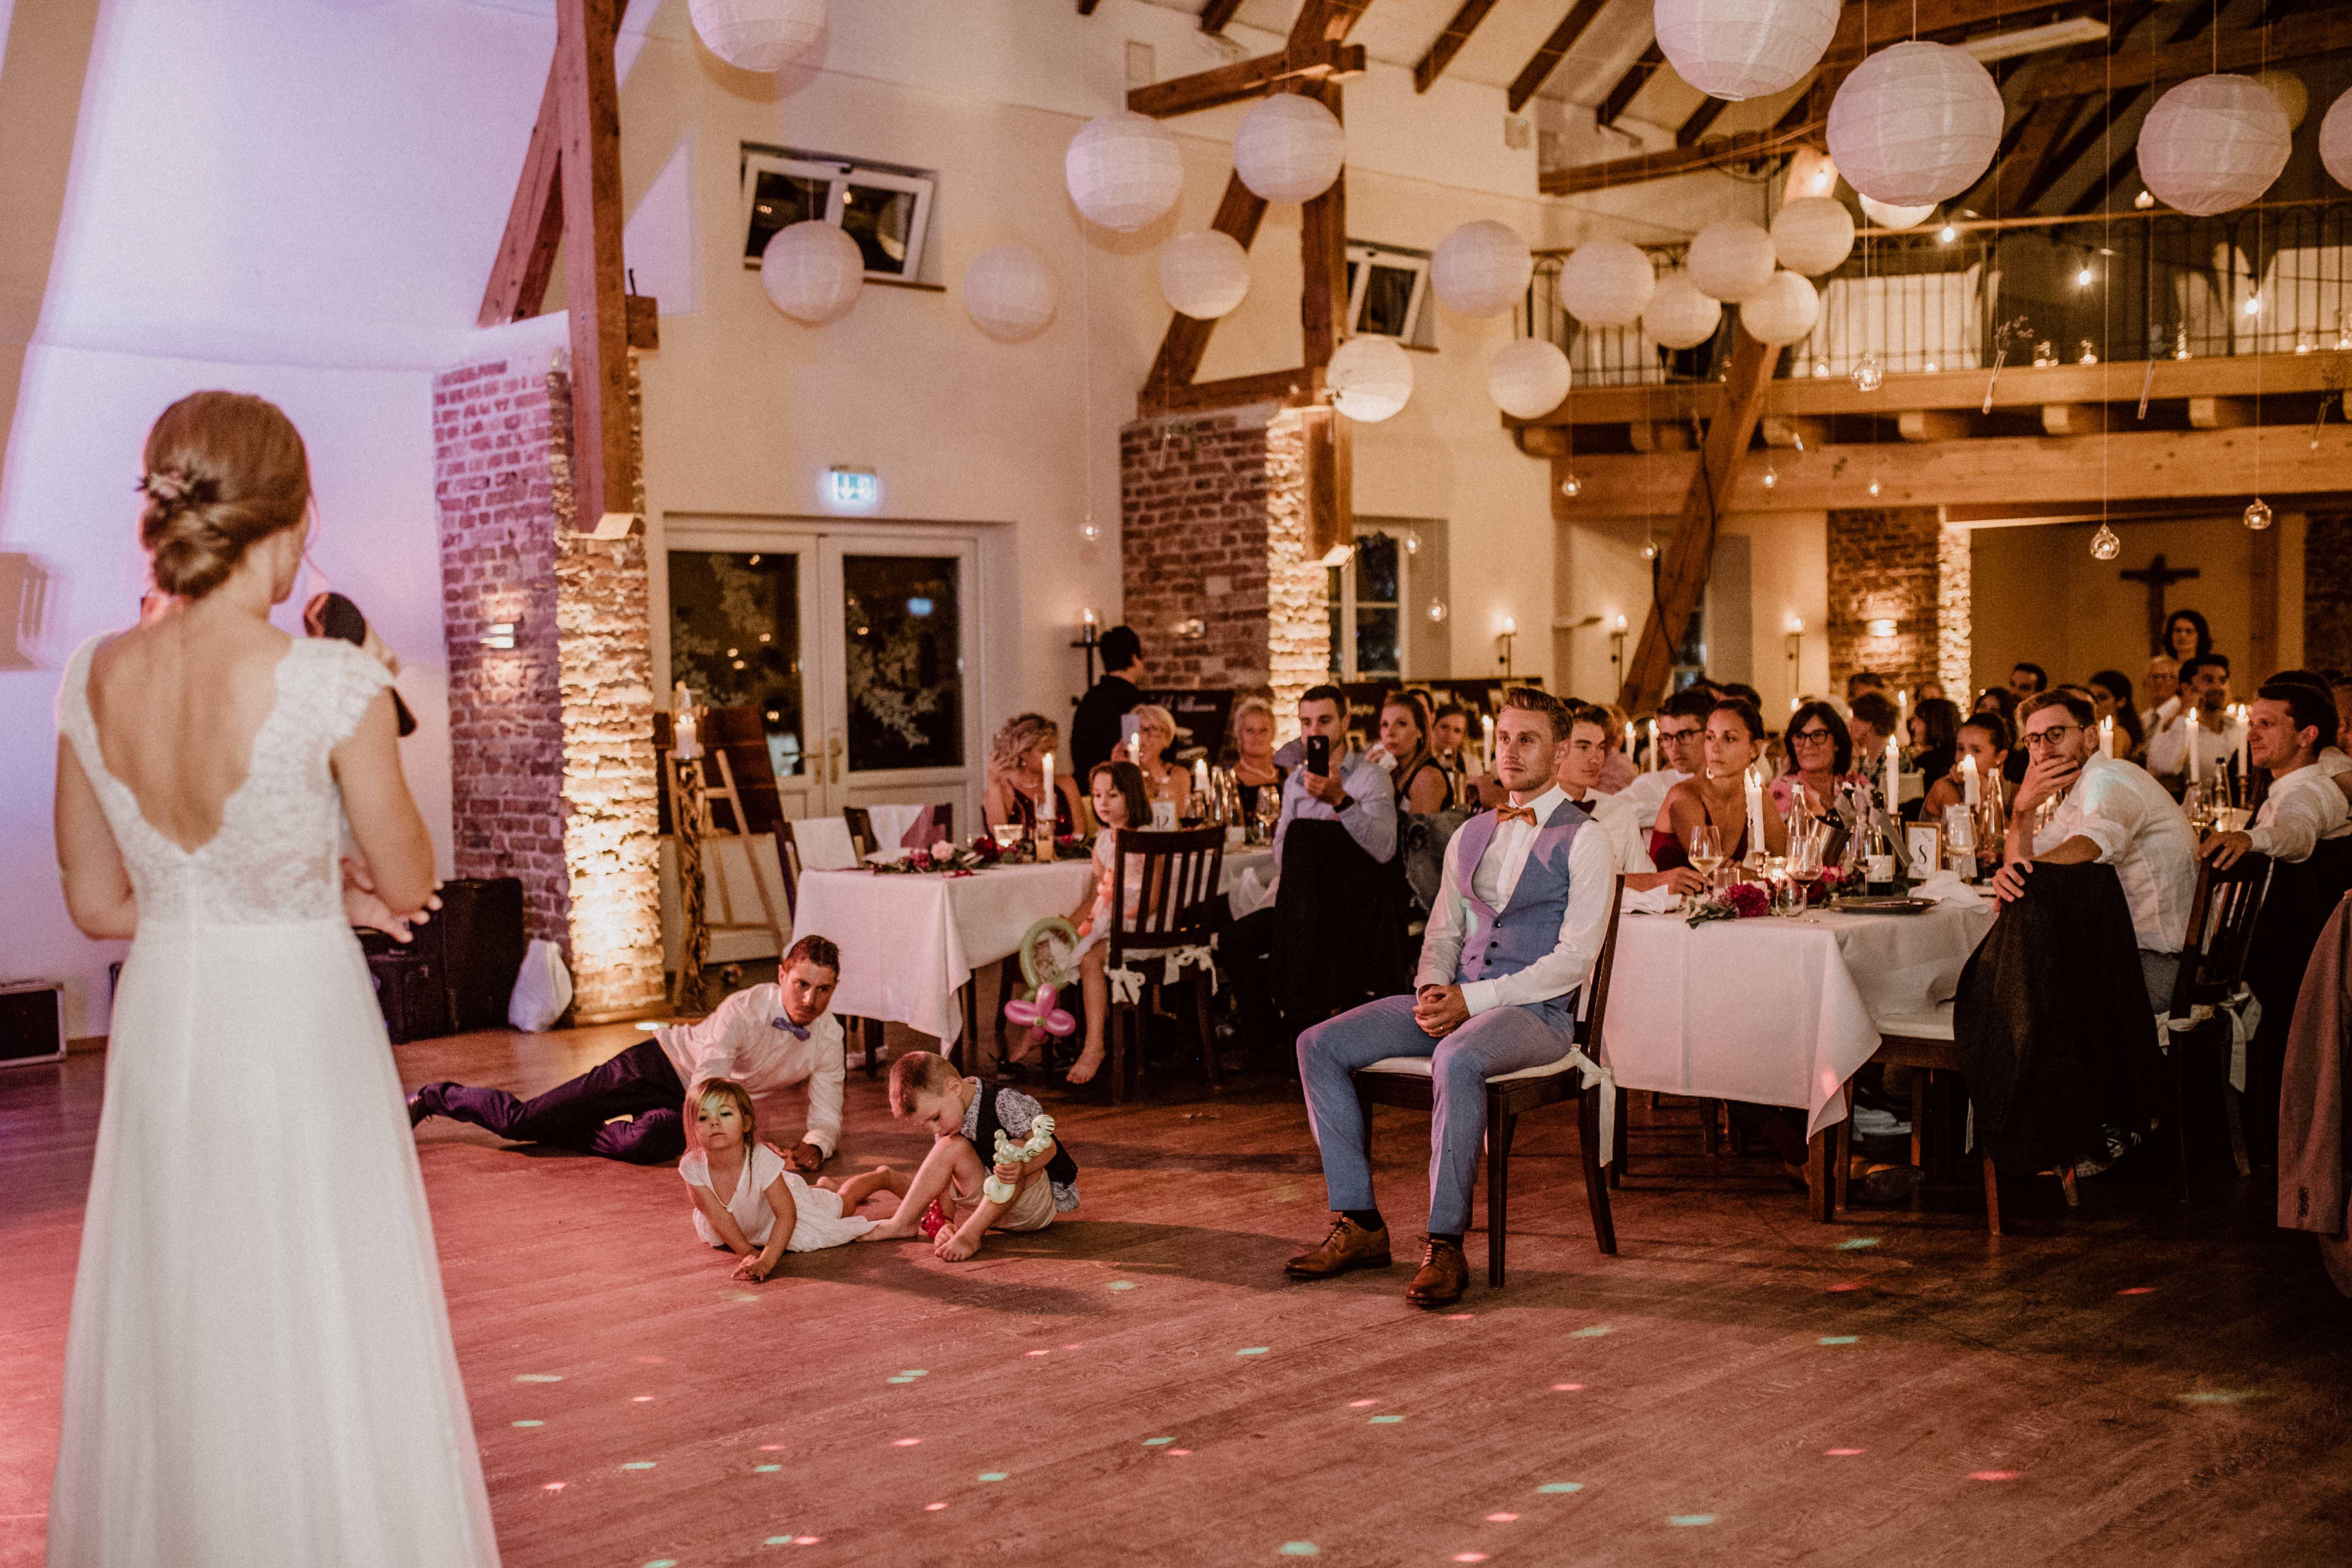 ed sheeran sonja poehlmann photography wedding muenchen bayern